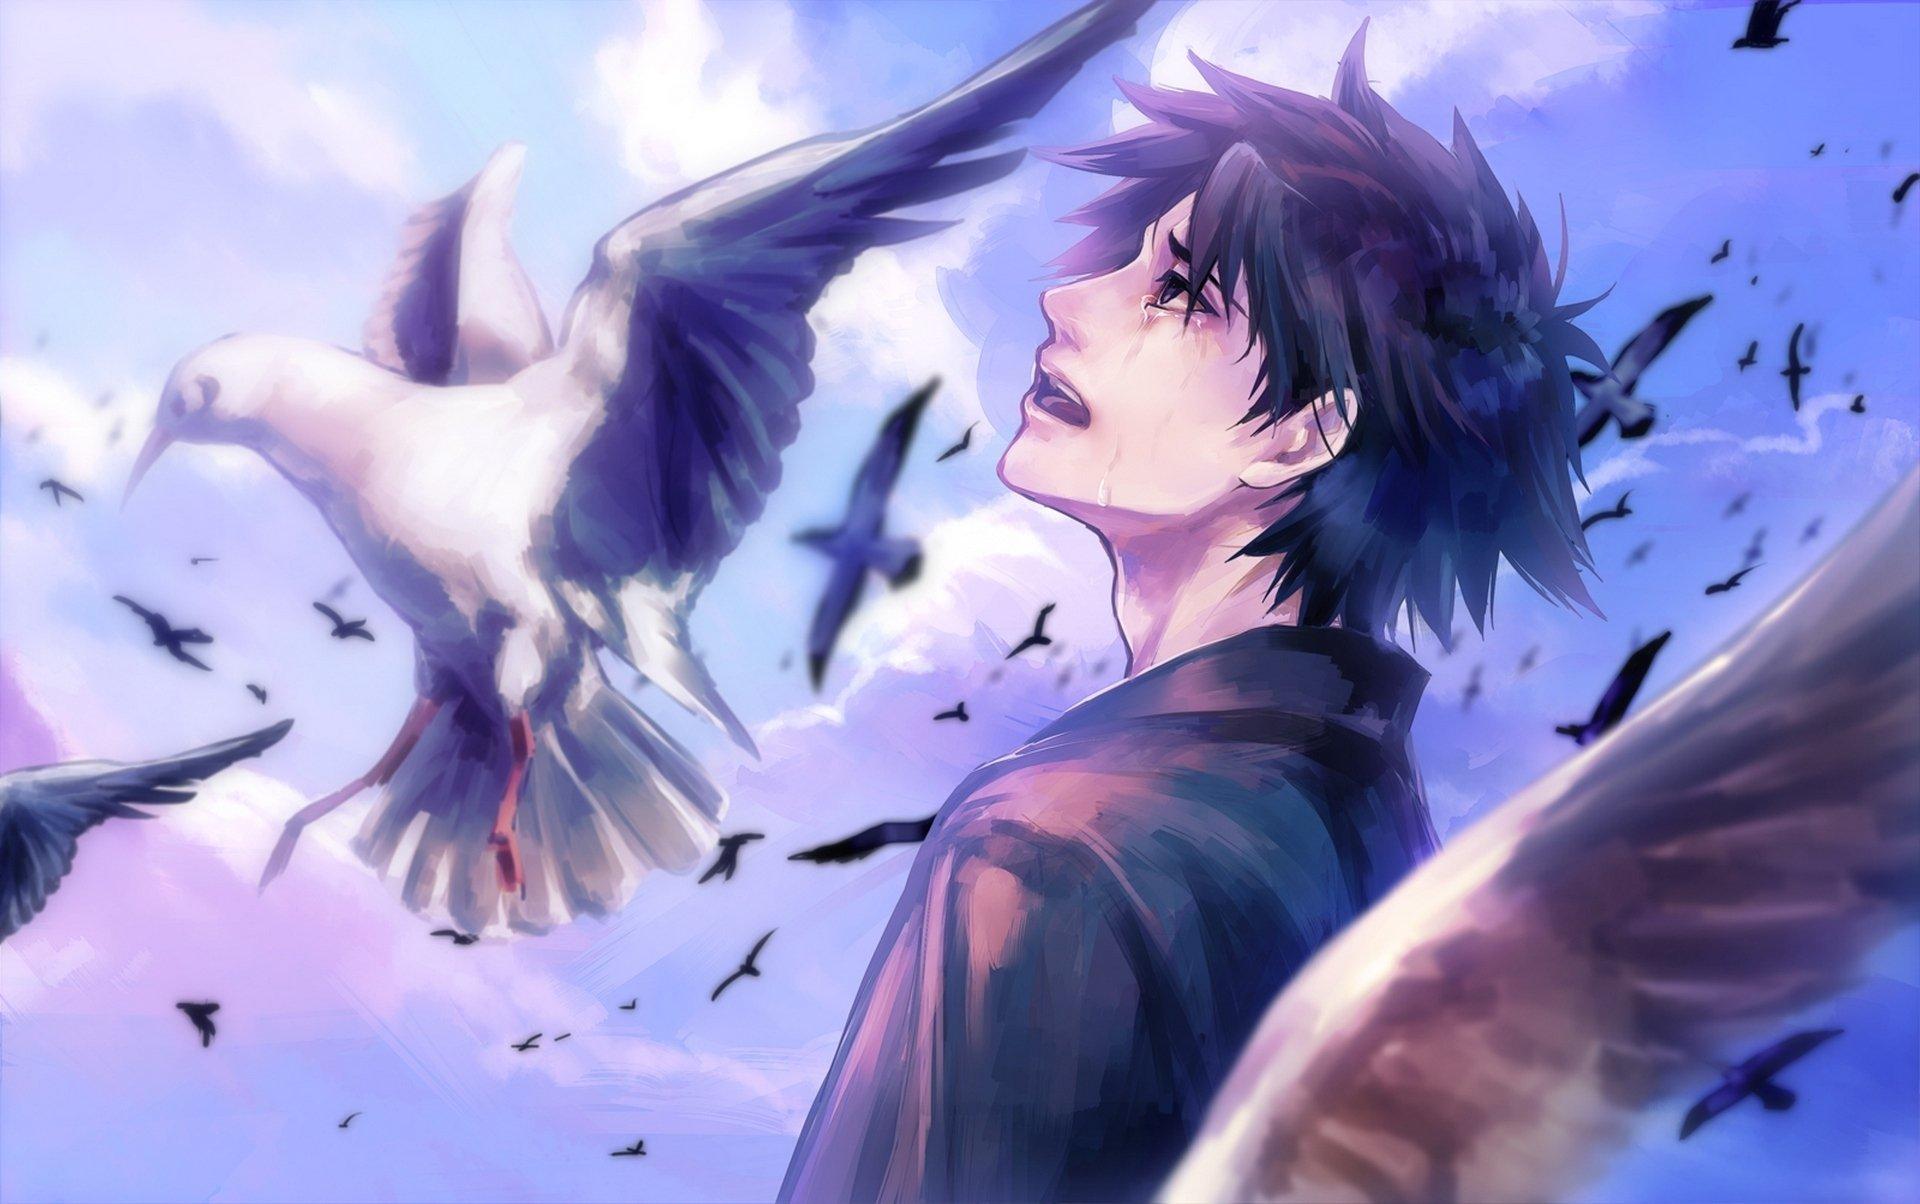 Anime Boy Cry Bird Clouds Sky Wallpaper